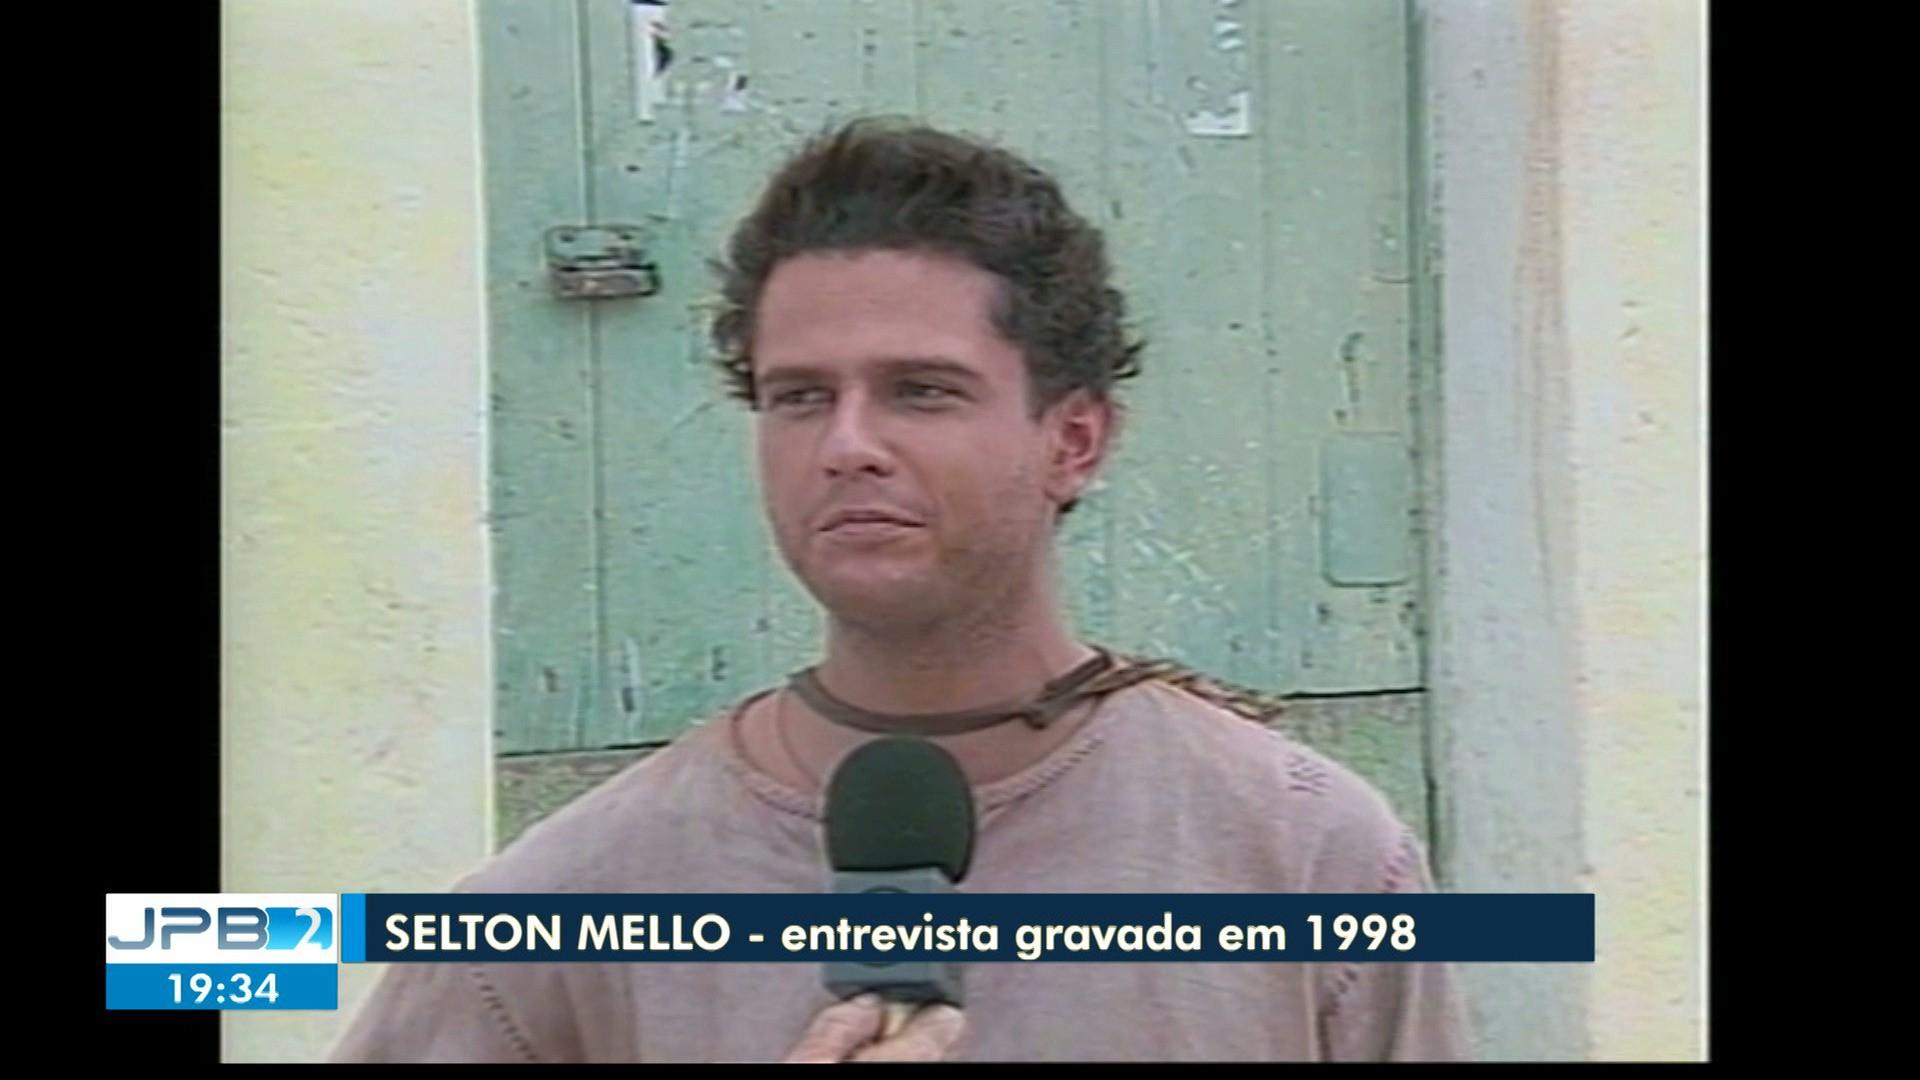 VÍDEOS: 70 anos da TV no Brasil